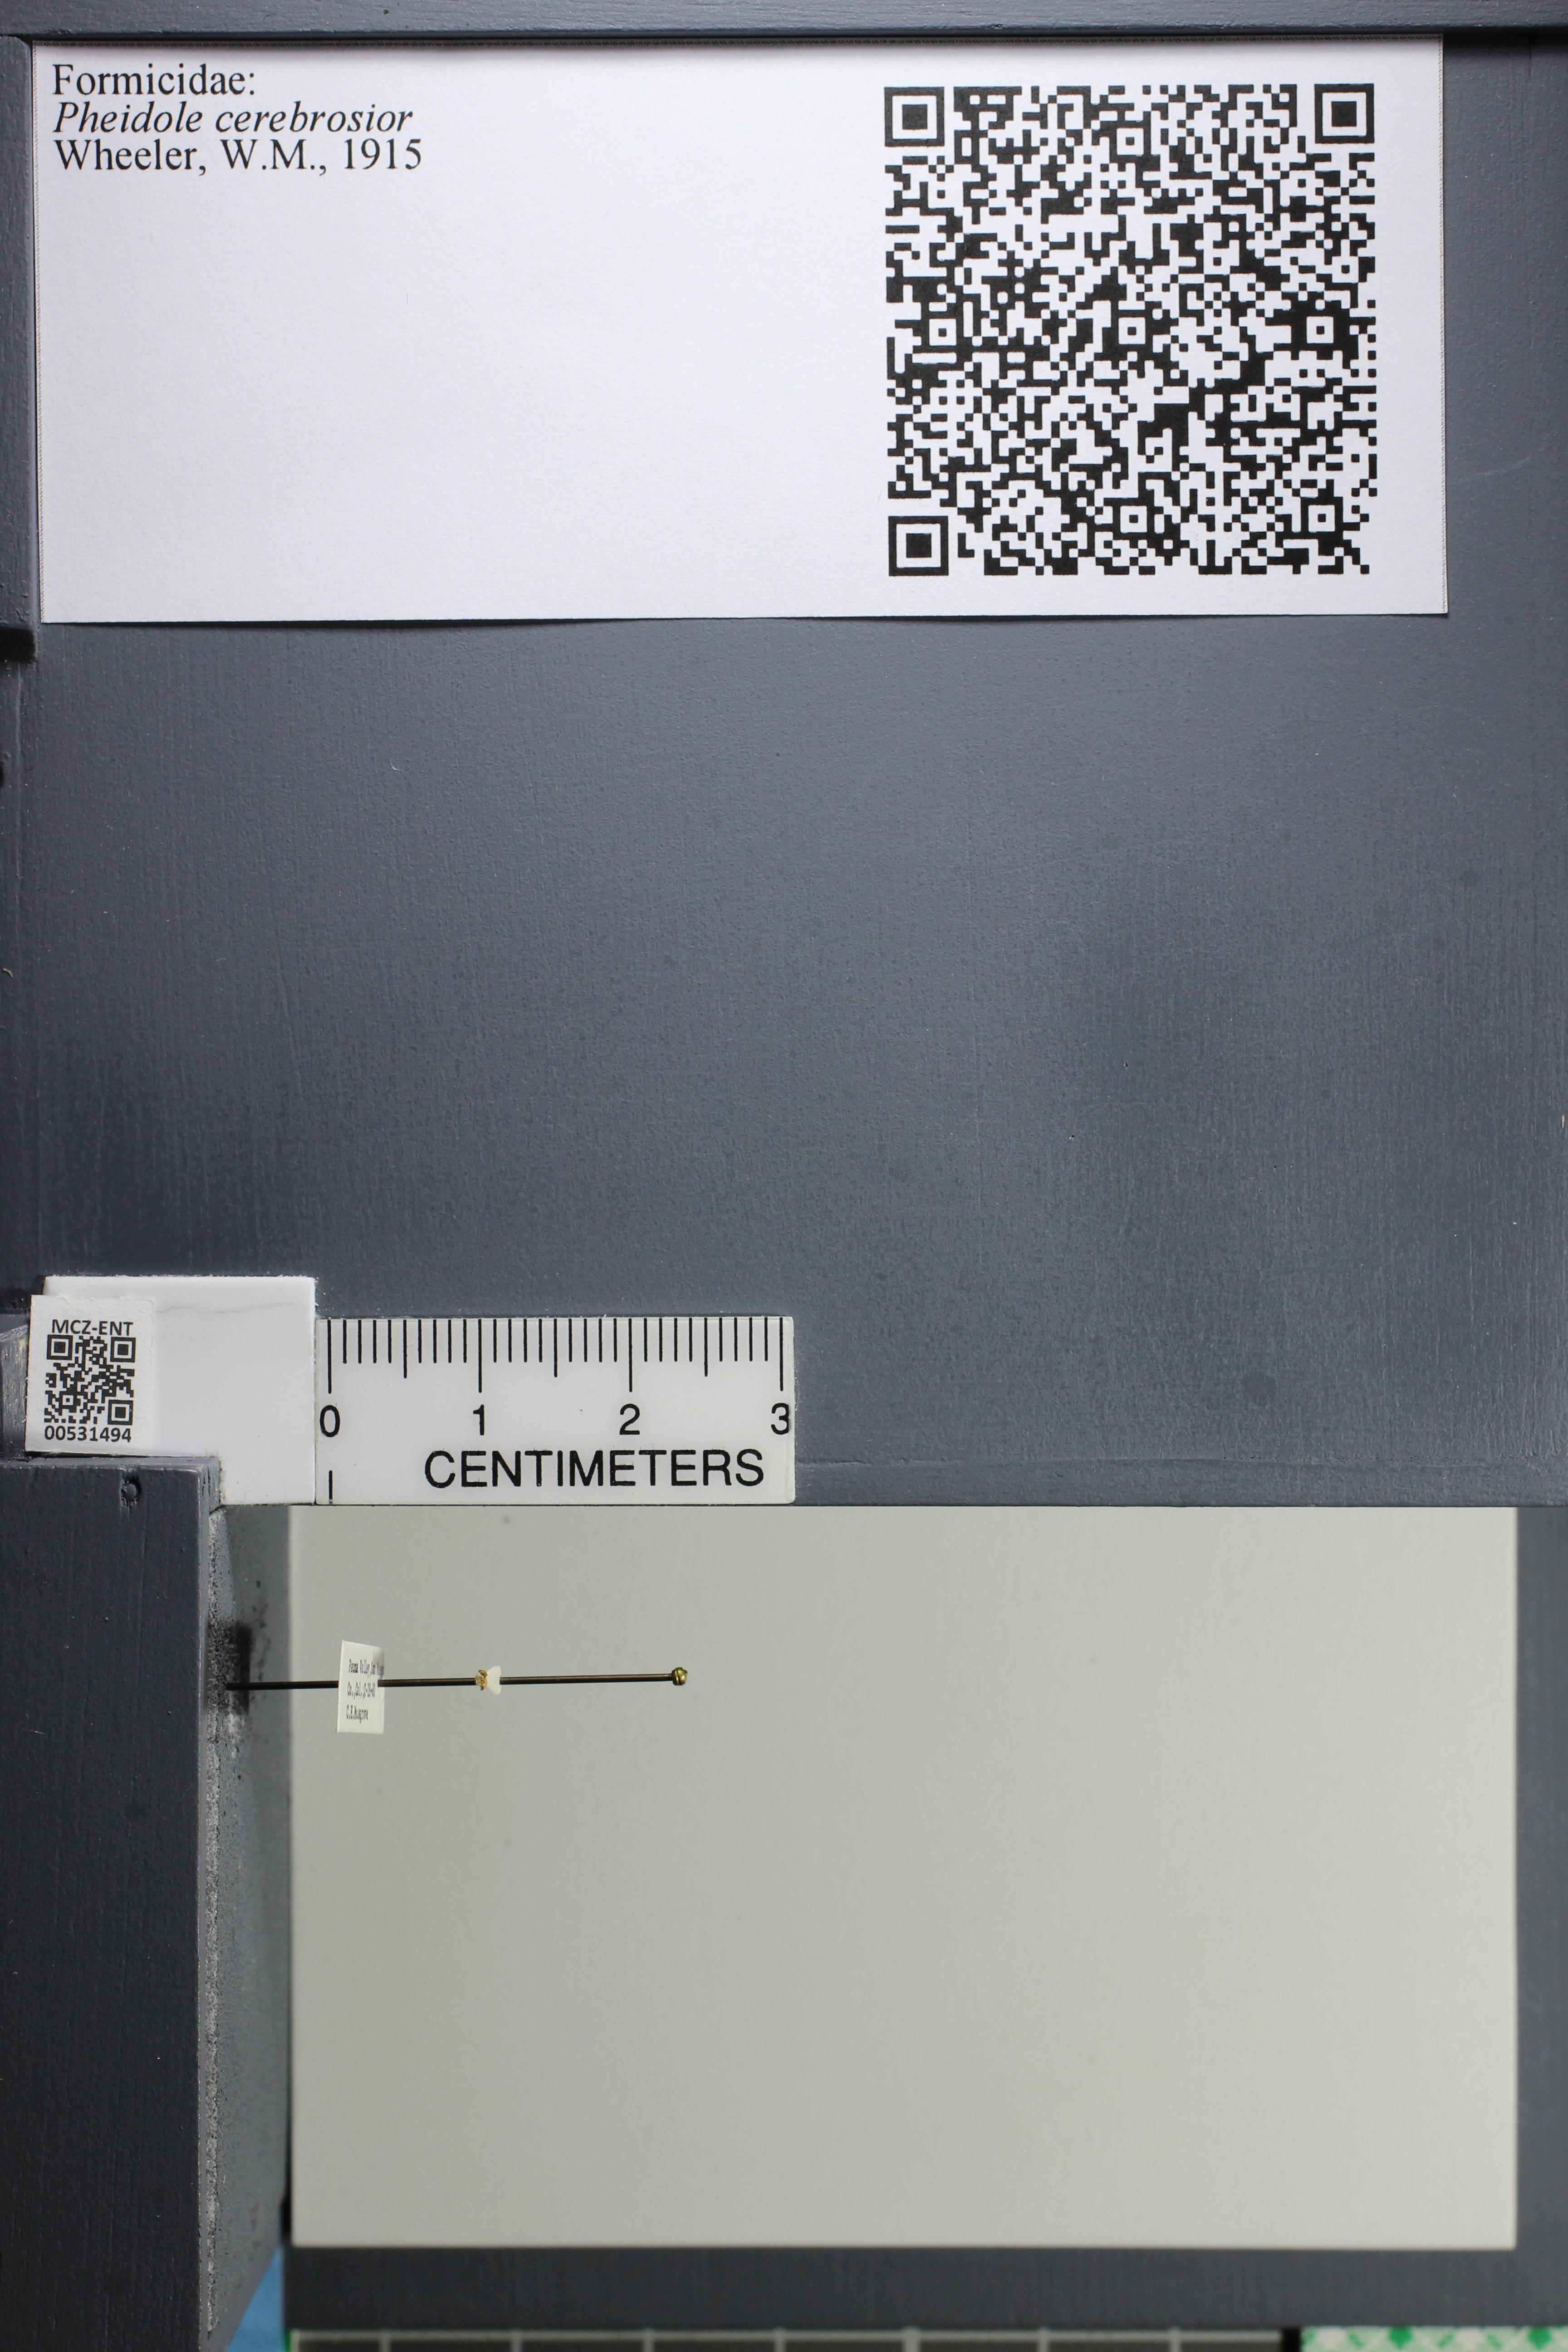 Media of type image, MCZ:Ent:531494 Identified as Pheidole cerebrosior.